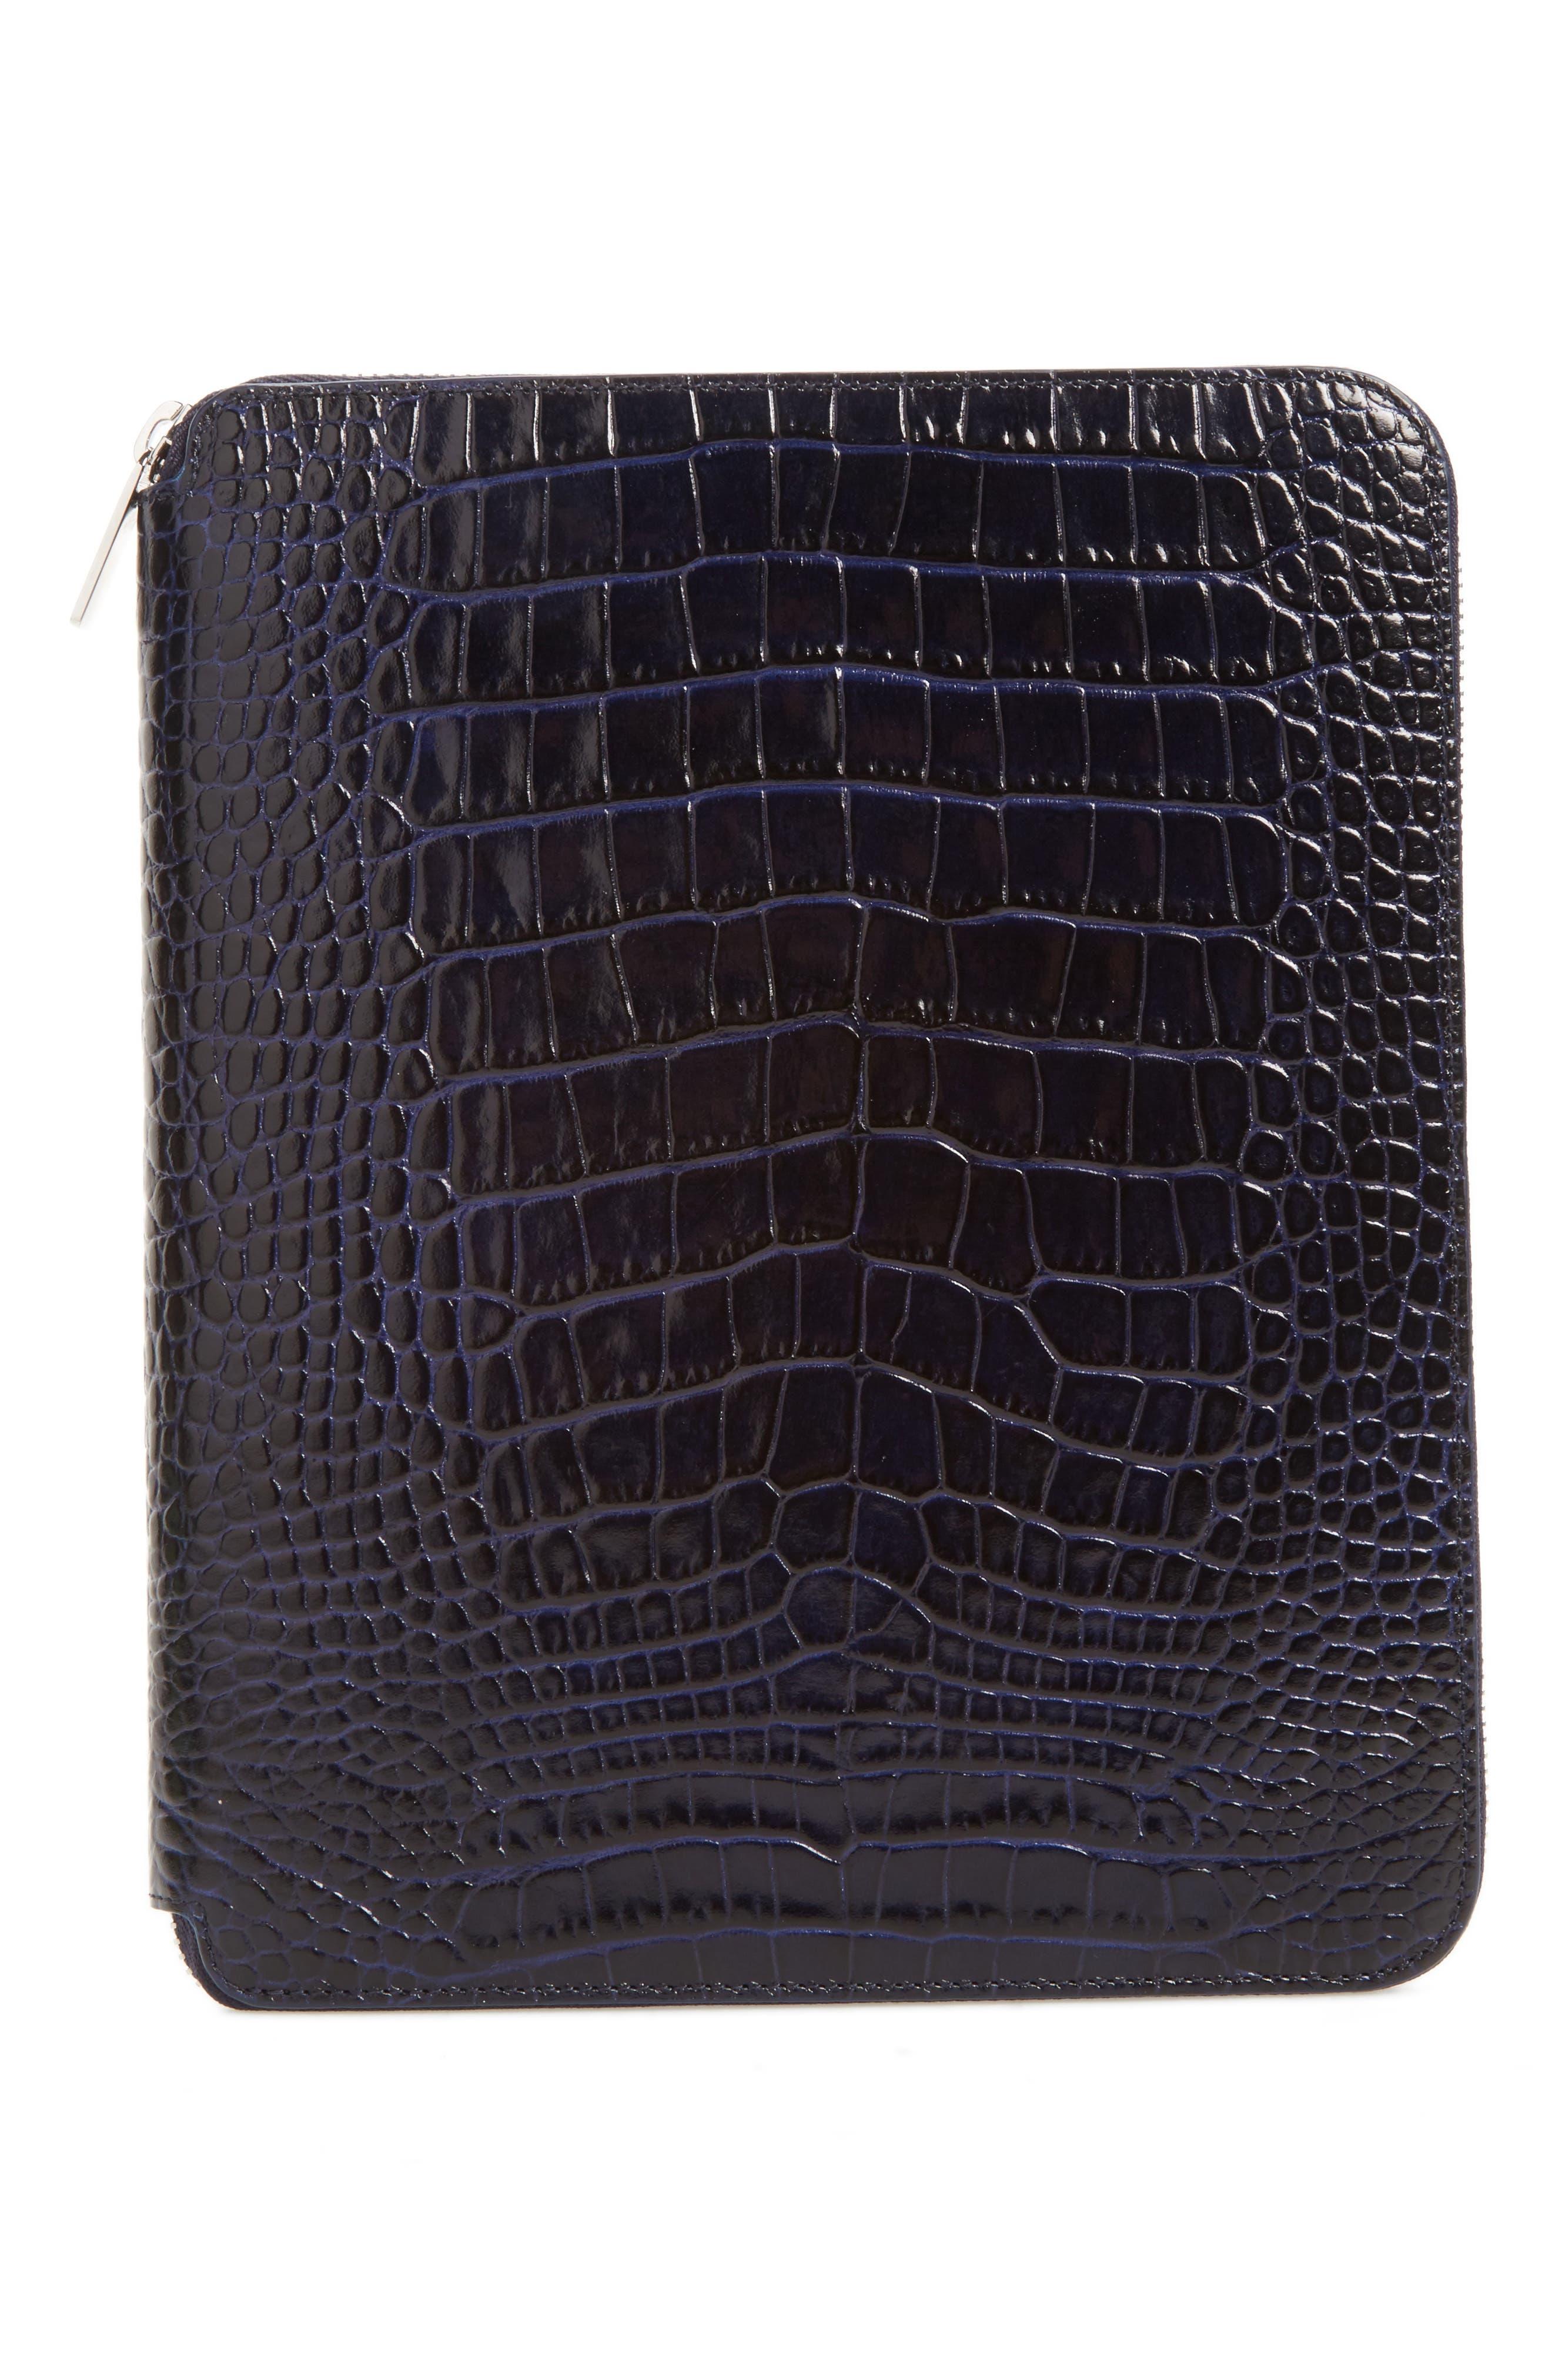 Alternate Image 1 Selected - Smythson Mara Croc Embossed Zip Folder & A5 Notebook